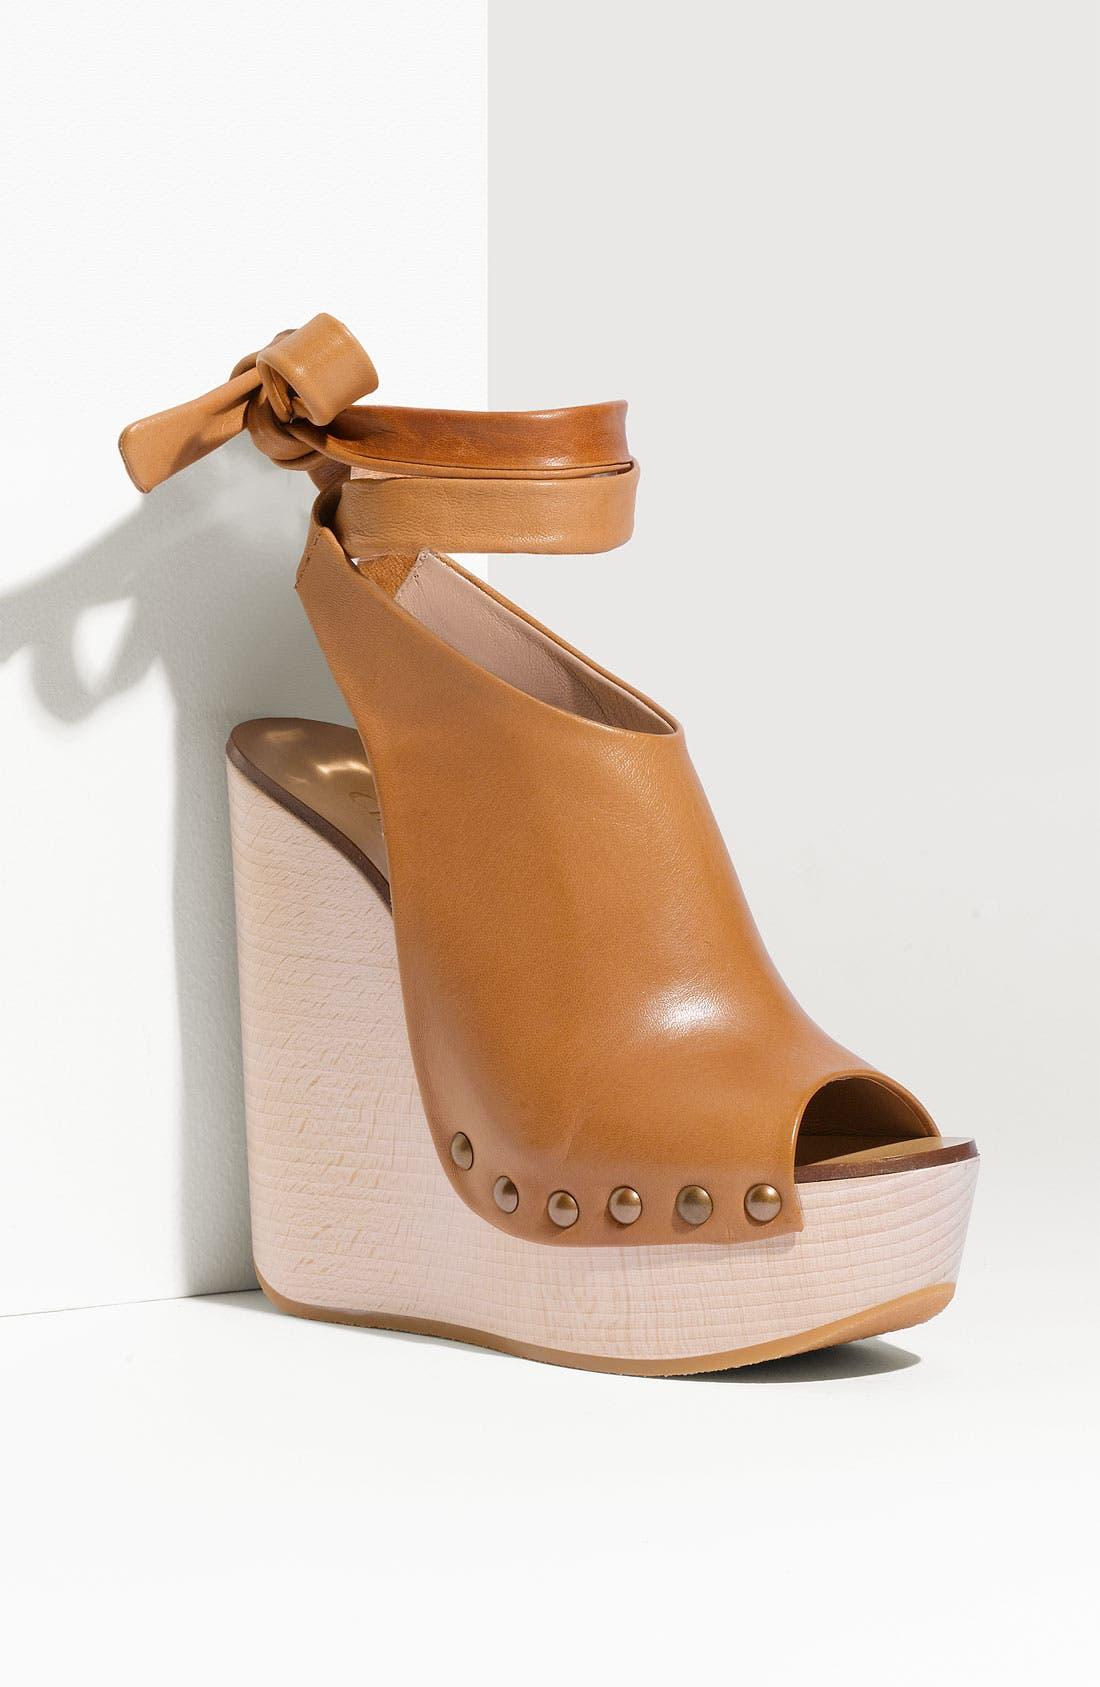 Main Image - Chloé 'Penelope' Wedge Sandal